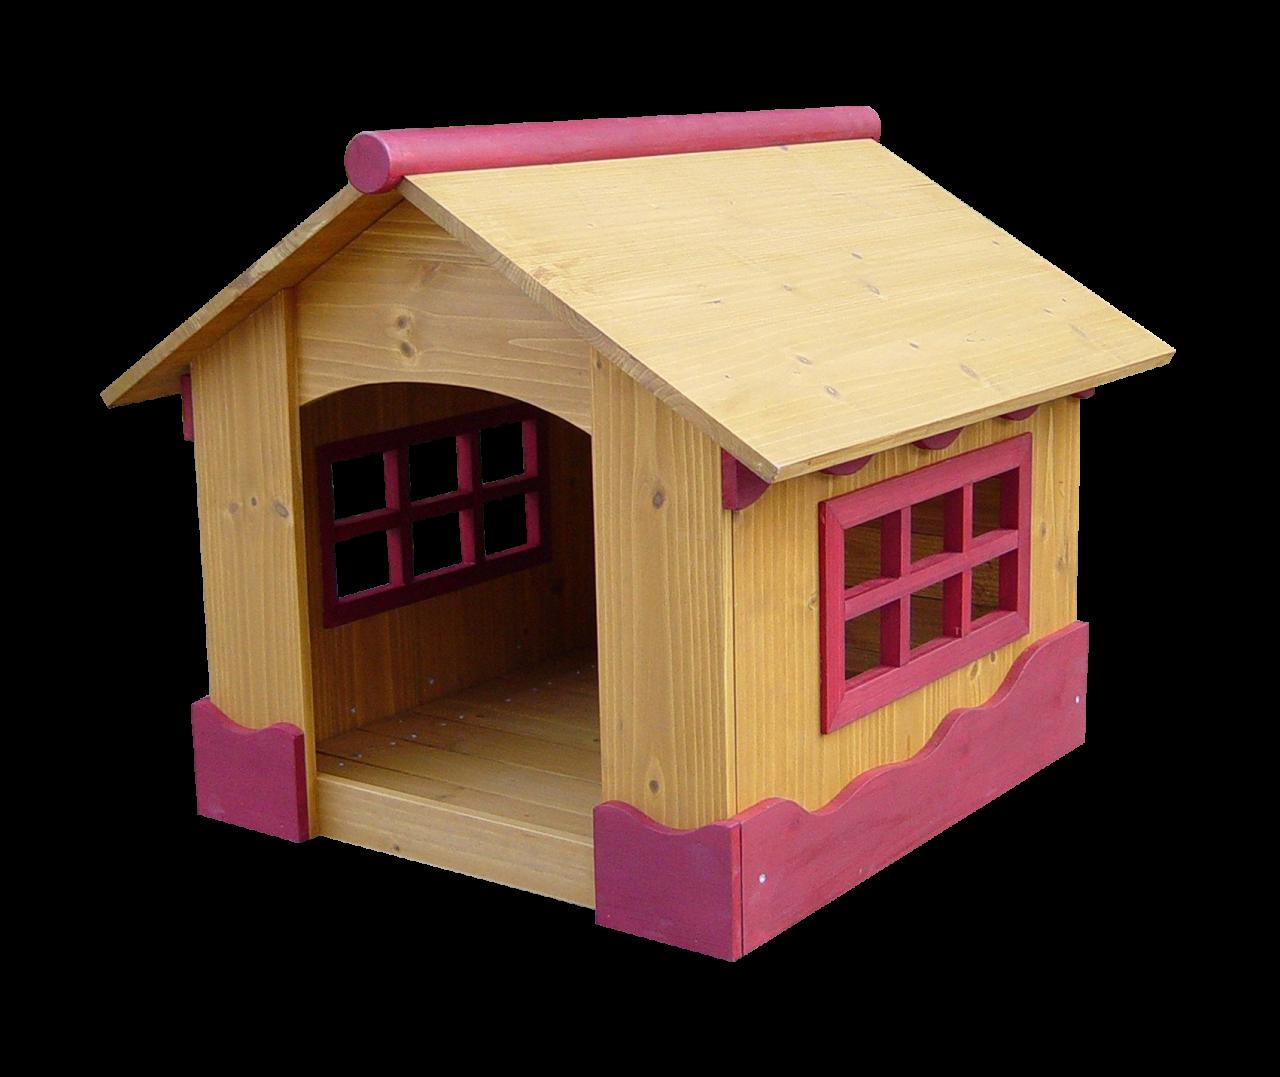 Dog Pet House PNG Image